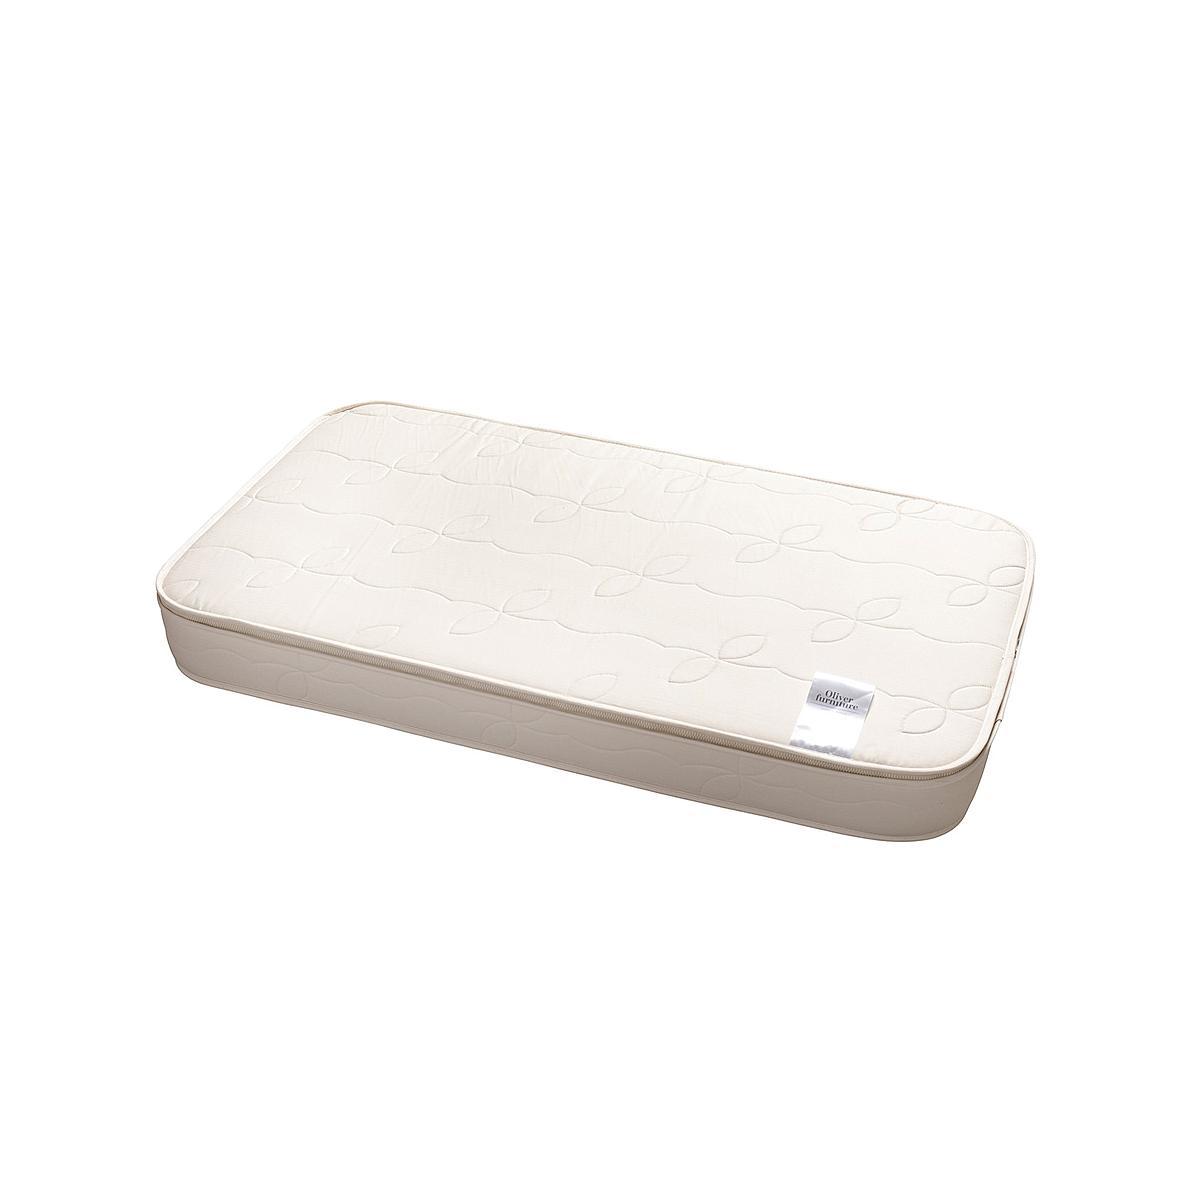 Colchón 68x122cm MINI+ WOOD Oliver Furniture